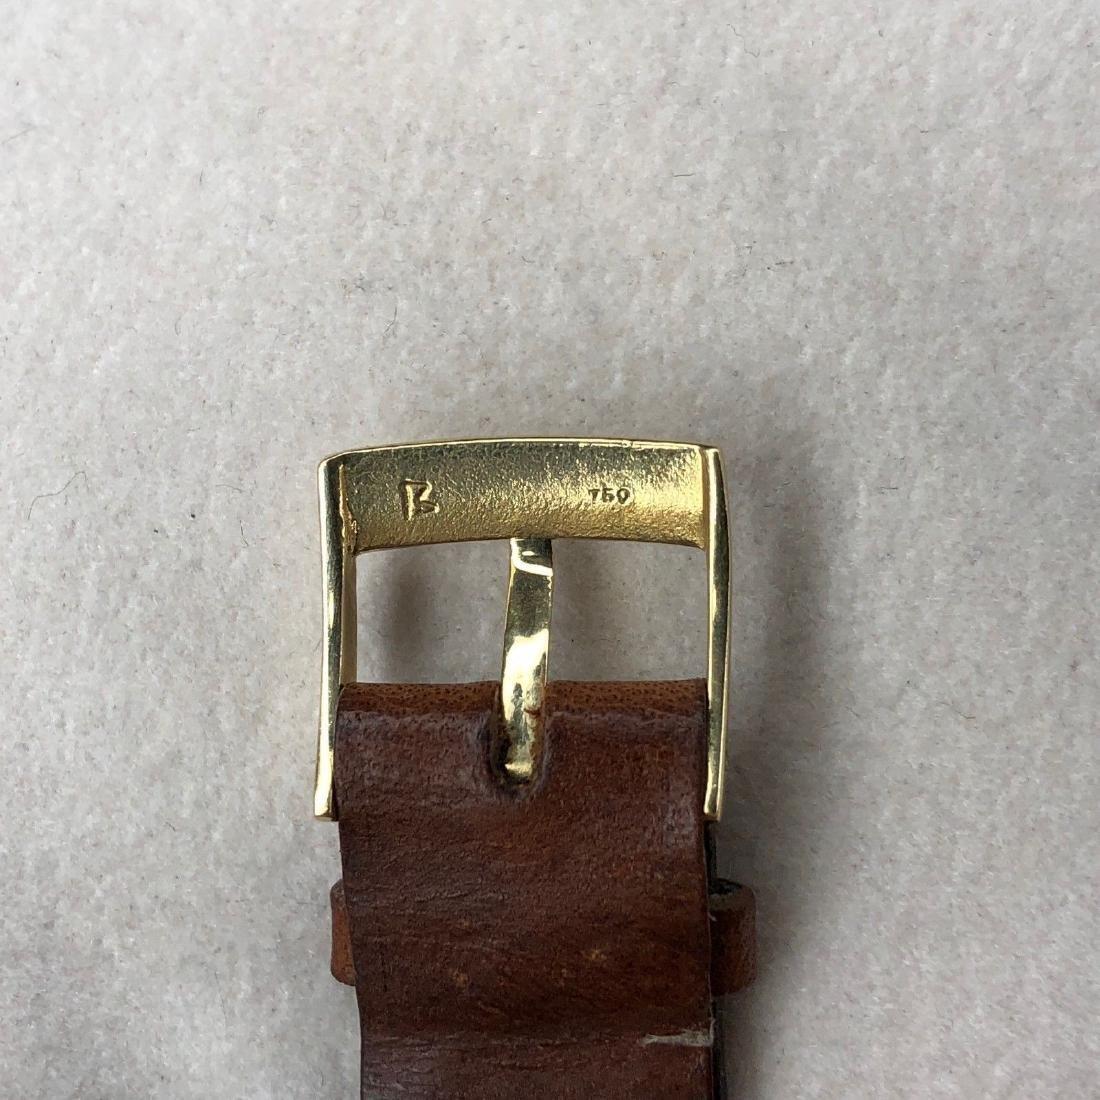 Vacheron Constantin Geneve 18k Yellow Gold Cream Dial - 6